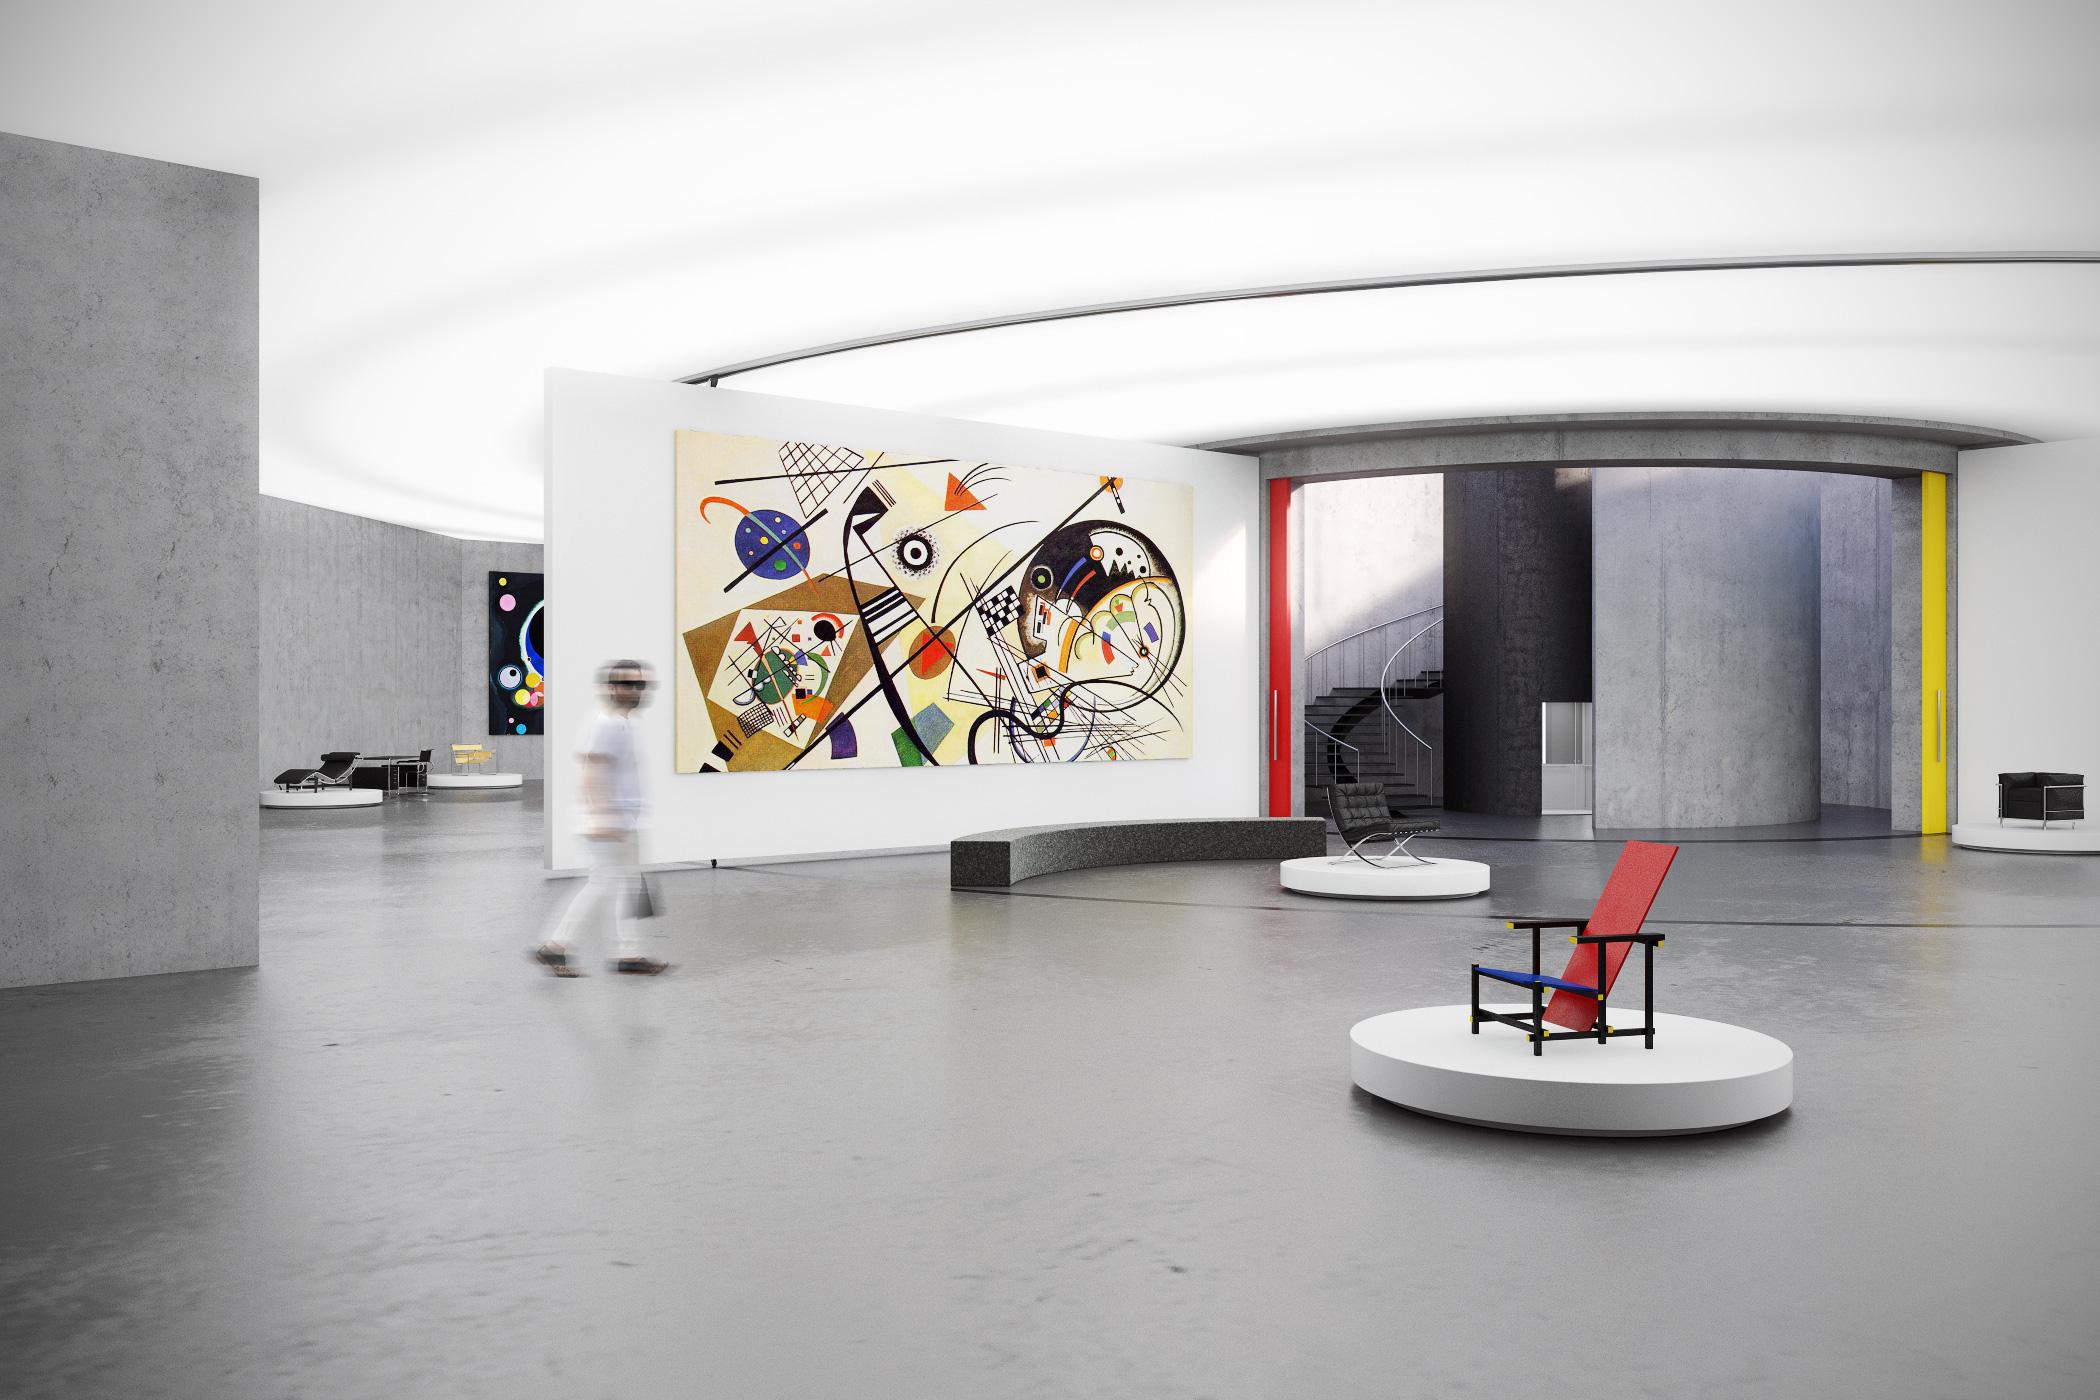 architectural-visualization-bauhaus-museum-competition-penda-architects.jpg